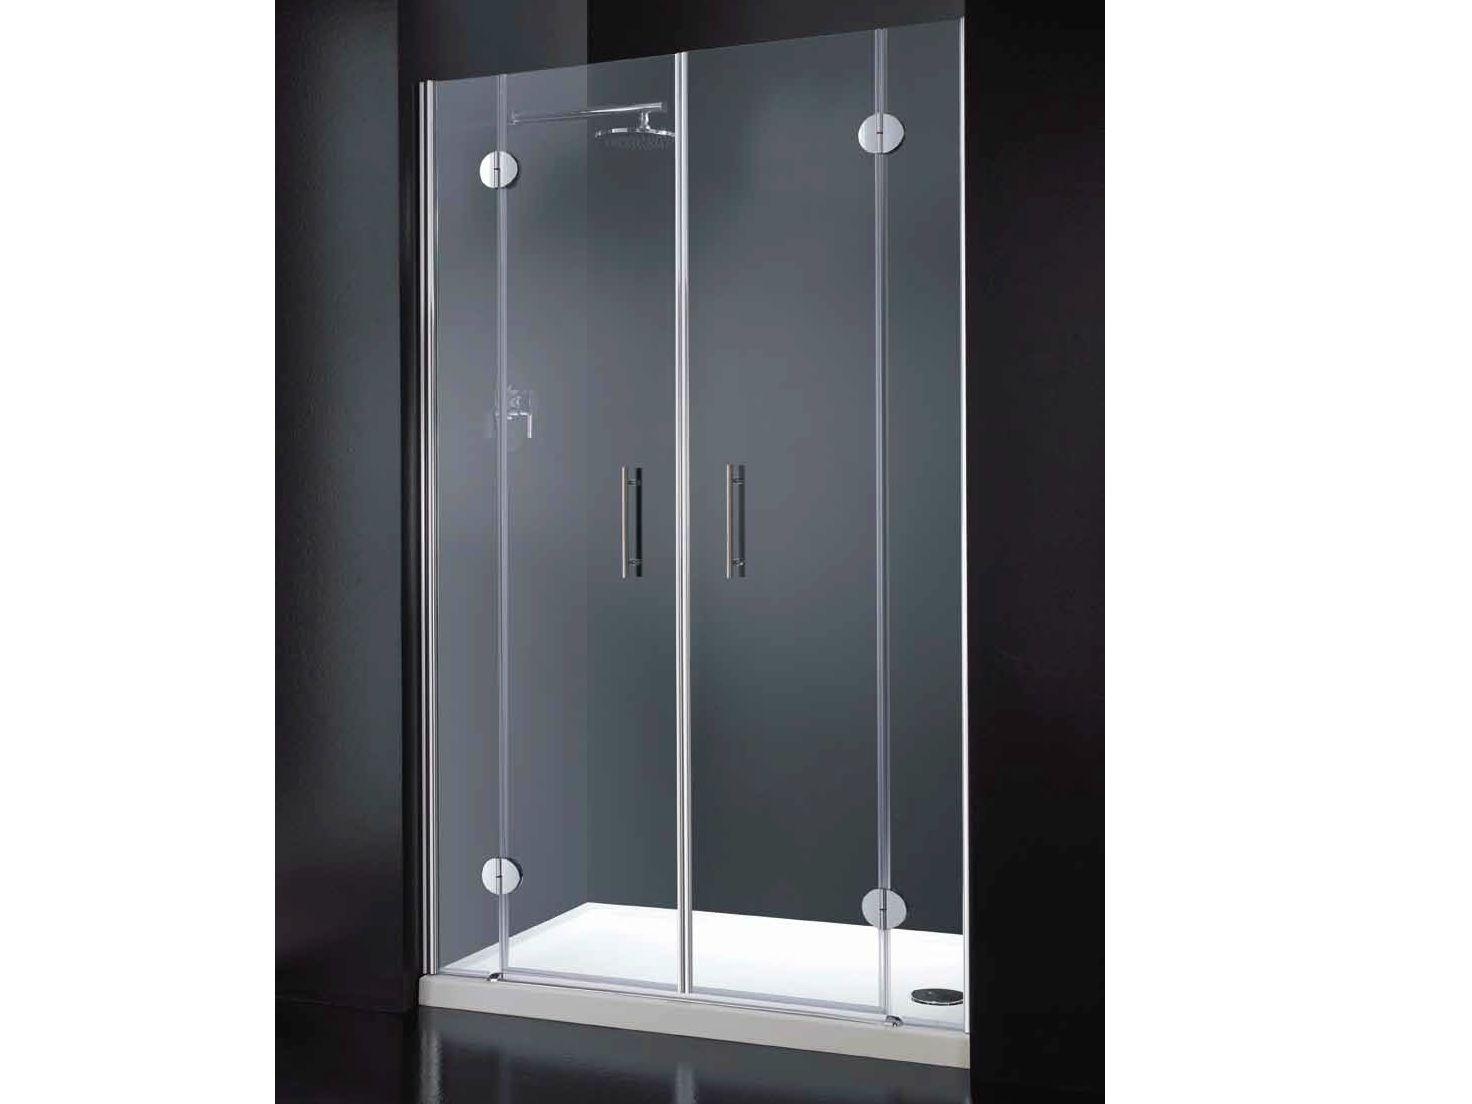 Tavoli mediaworld vendita cabine doccia - Cabine doccia su misura ...